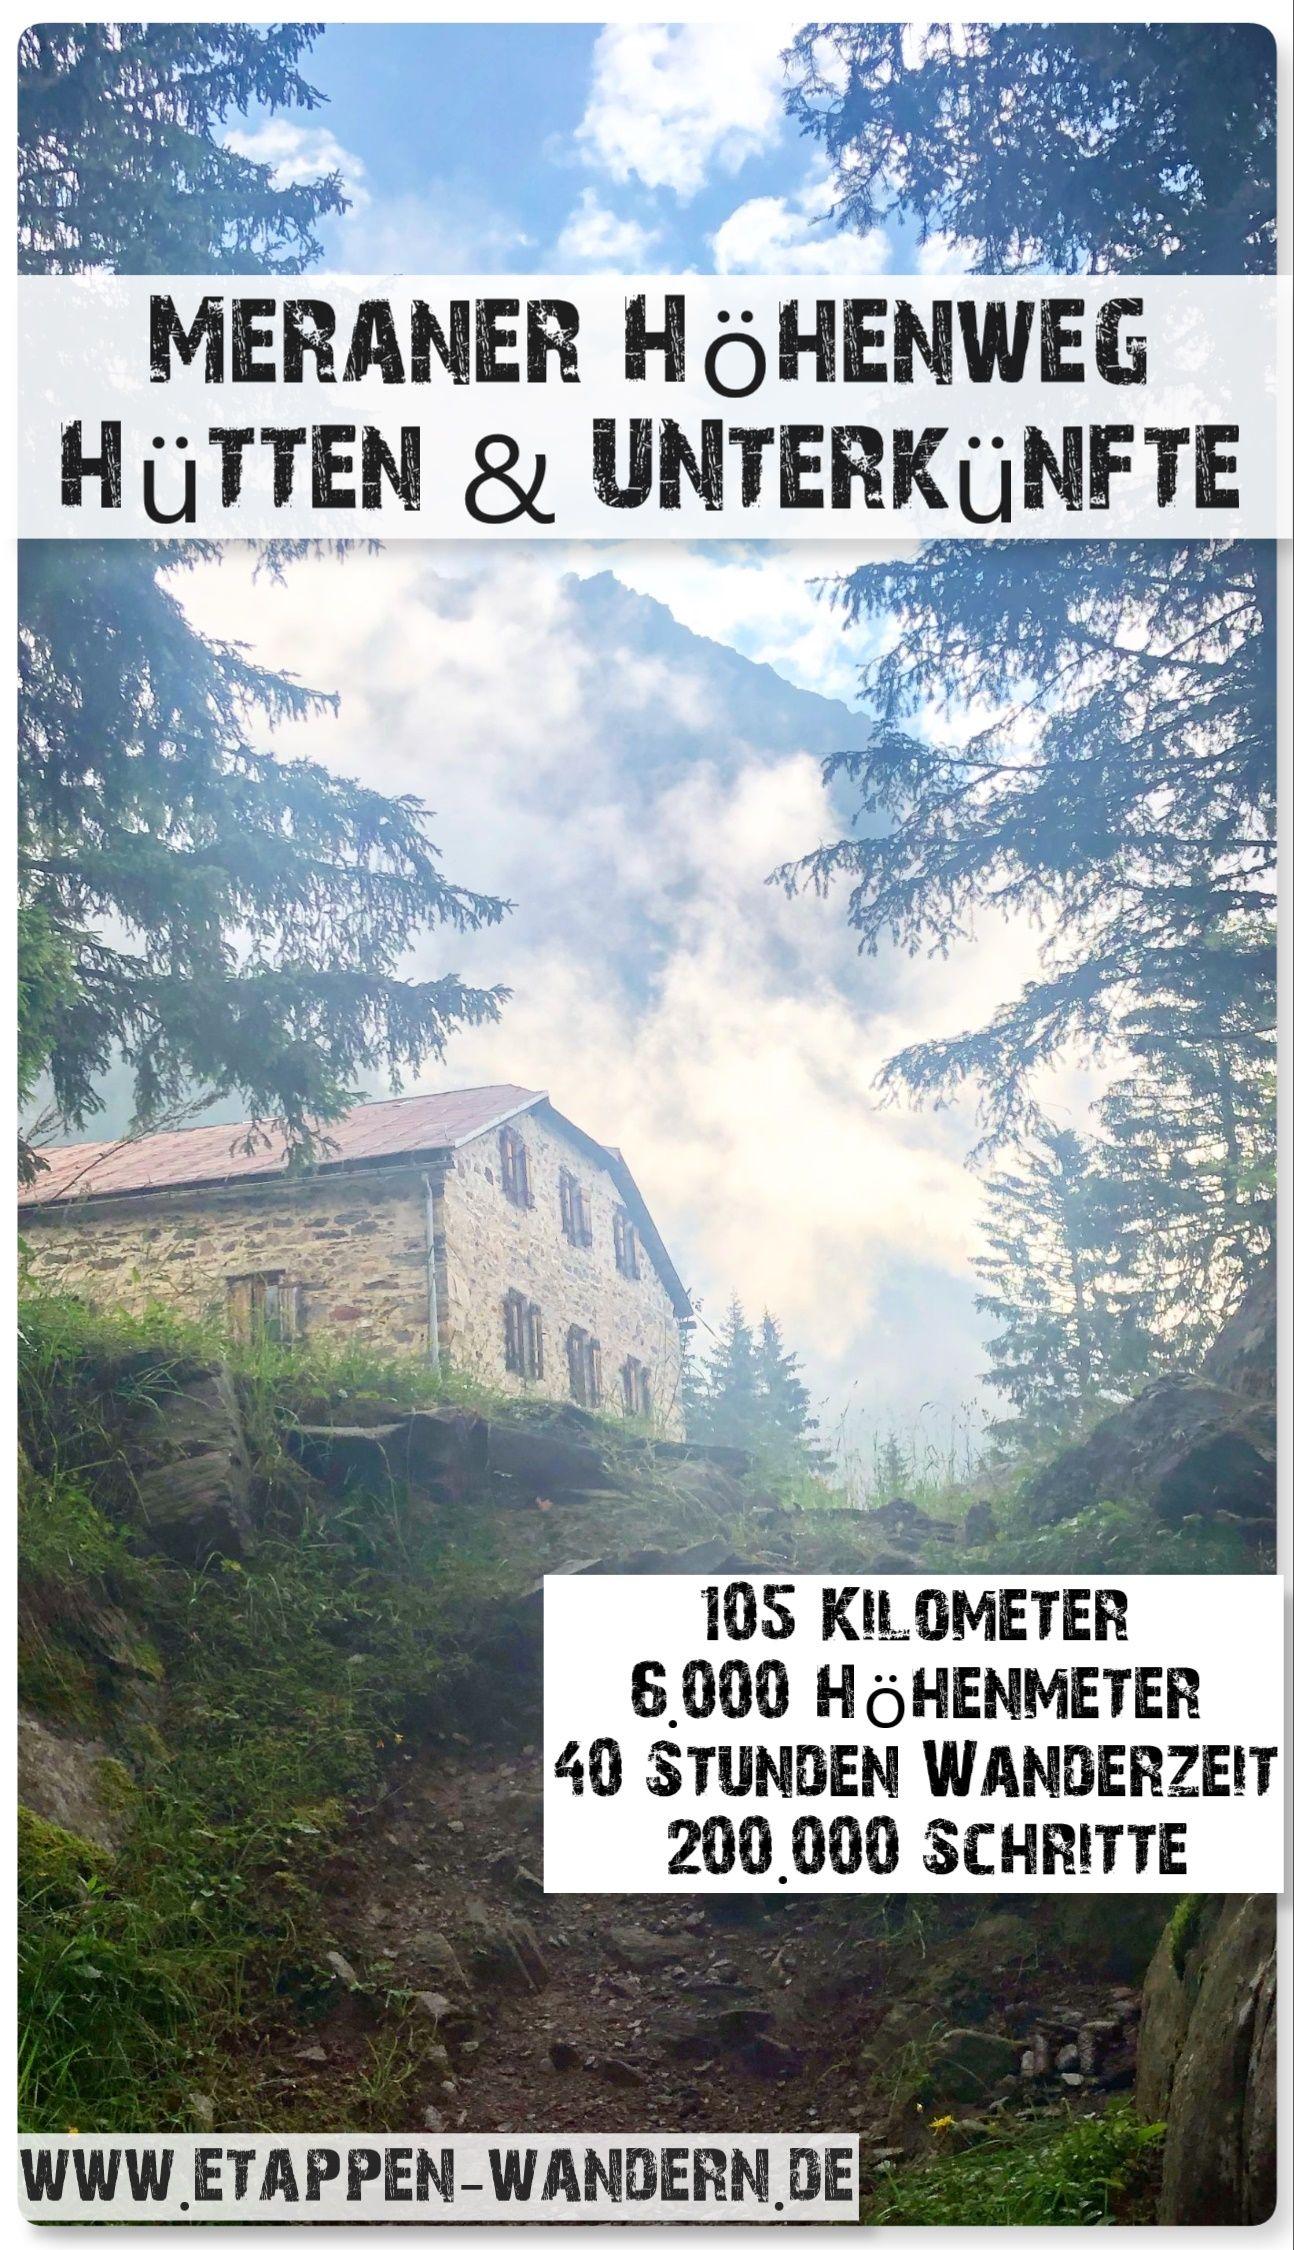 Meraner Höhenweg / Südtirol #hikingtrails